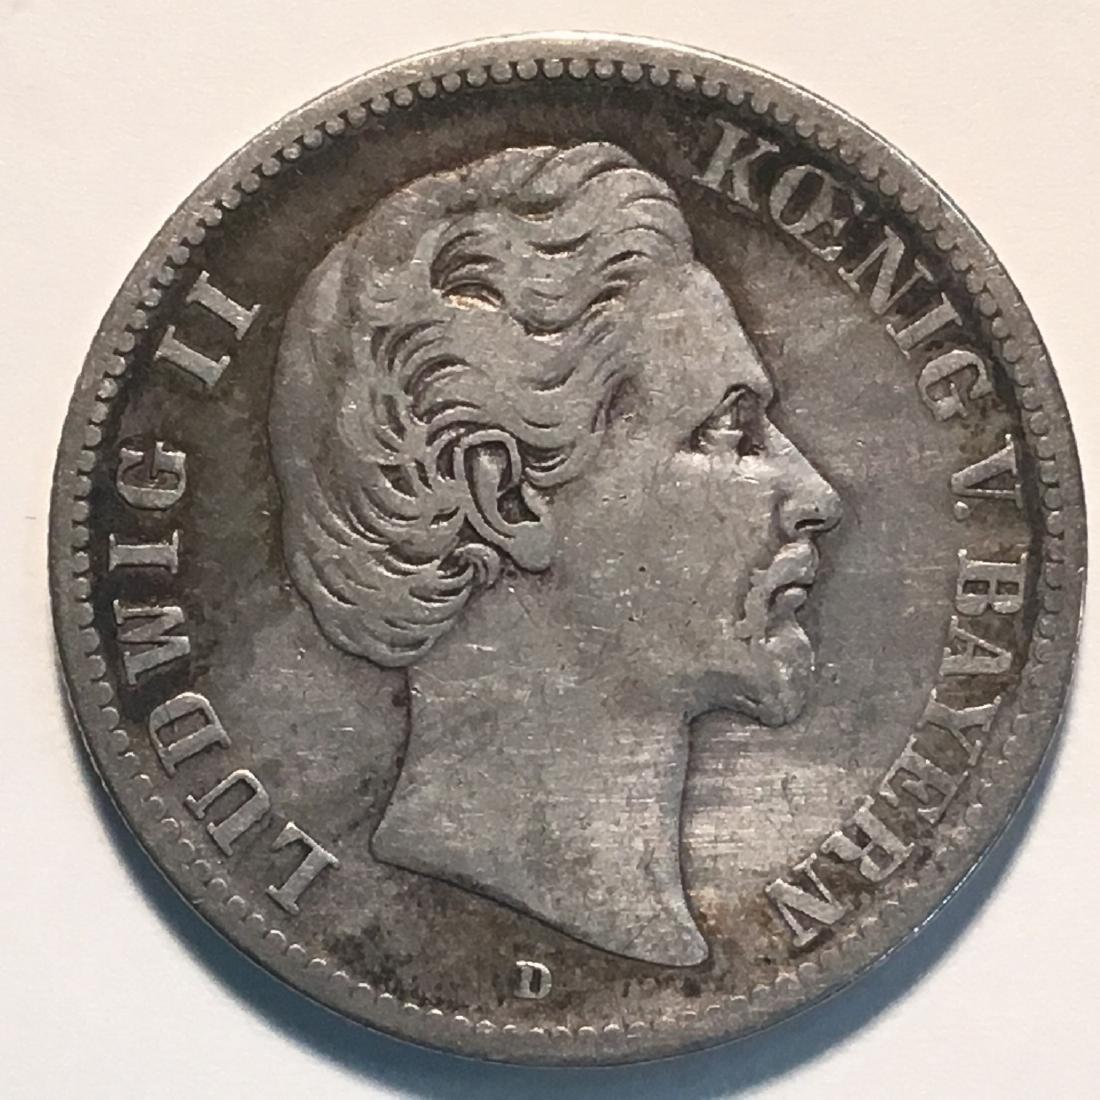 1876 GERMANY-BAVARIA 2 MARK CHVF .900 SILVER. .3215